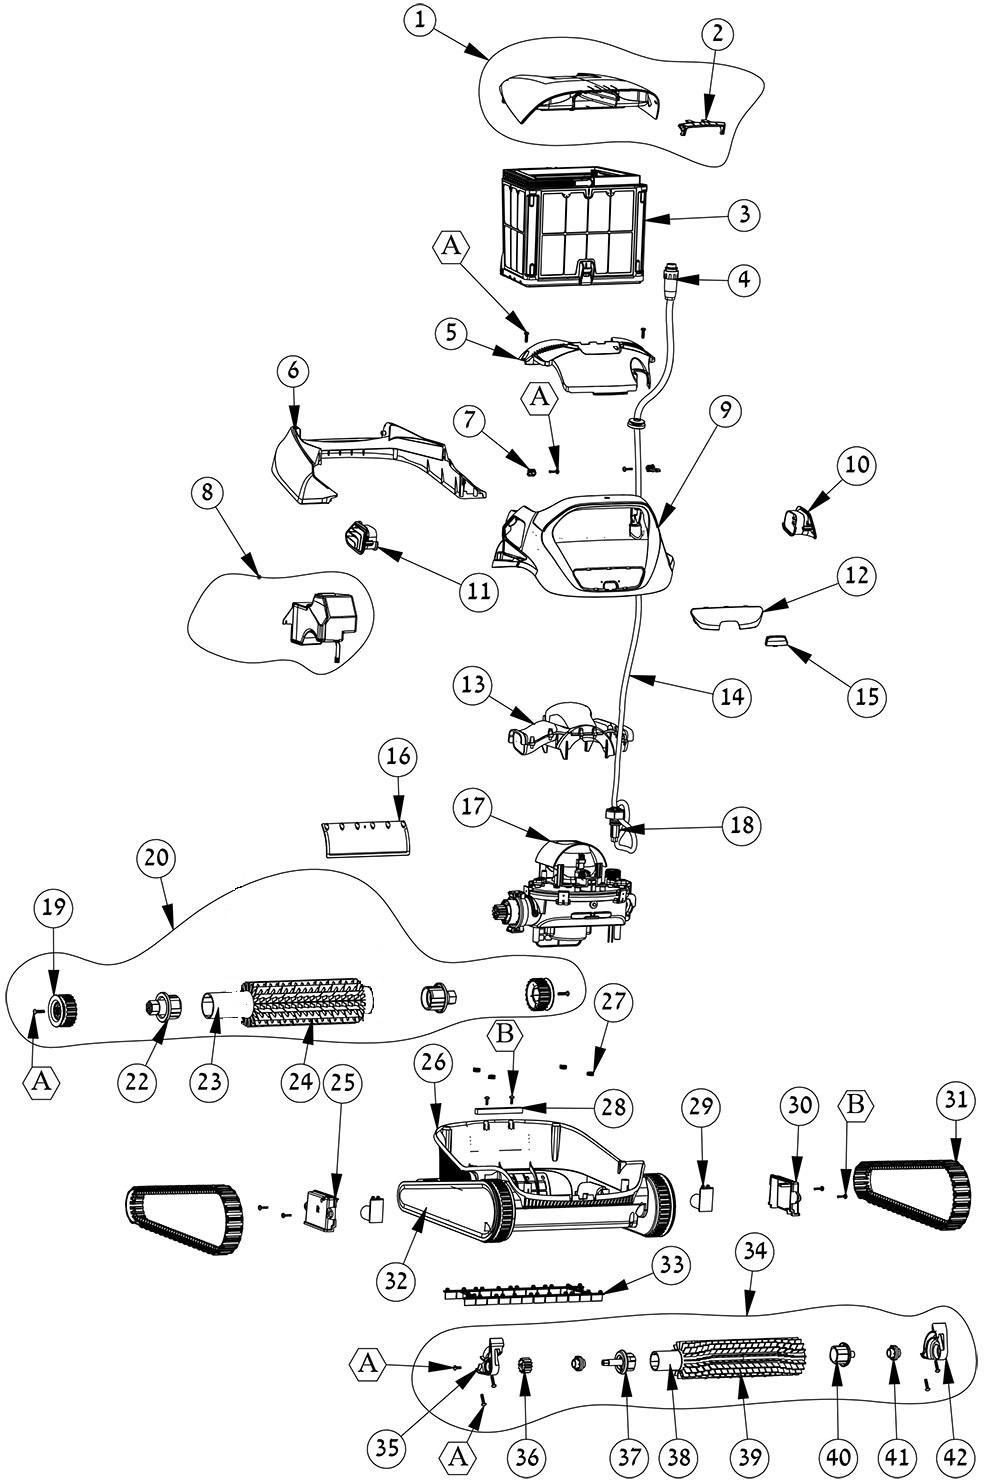 Dolphin Active 20 Parts Diagram E Z Test Pool Supplies